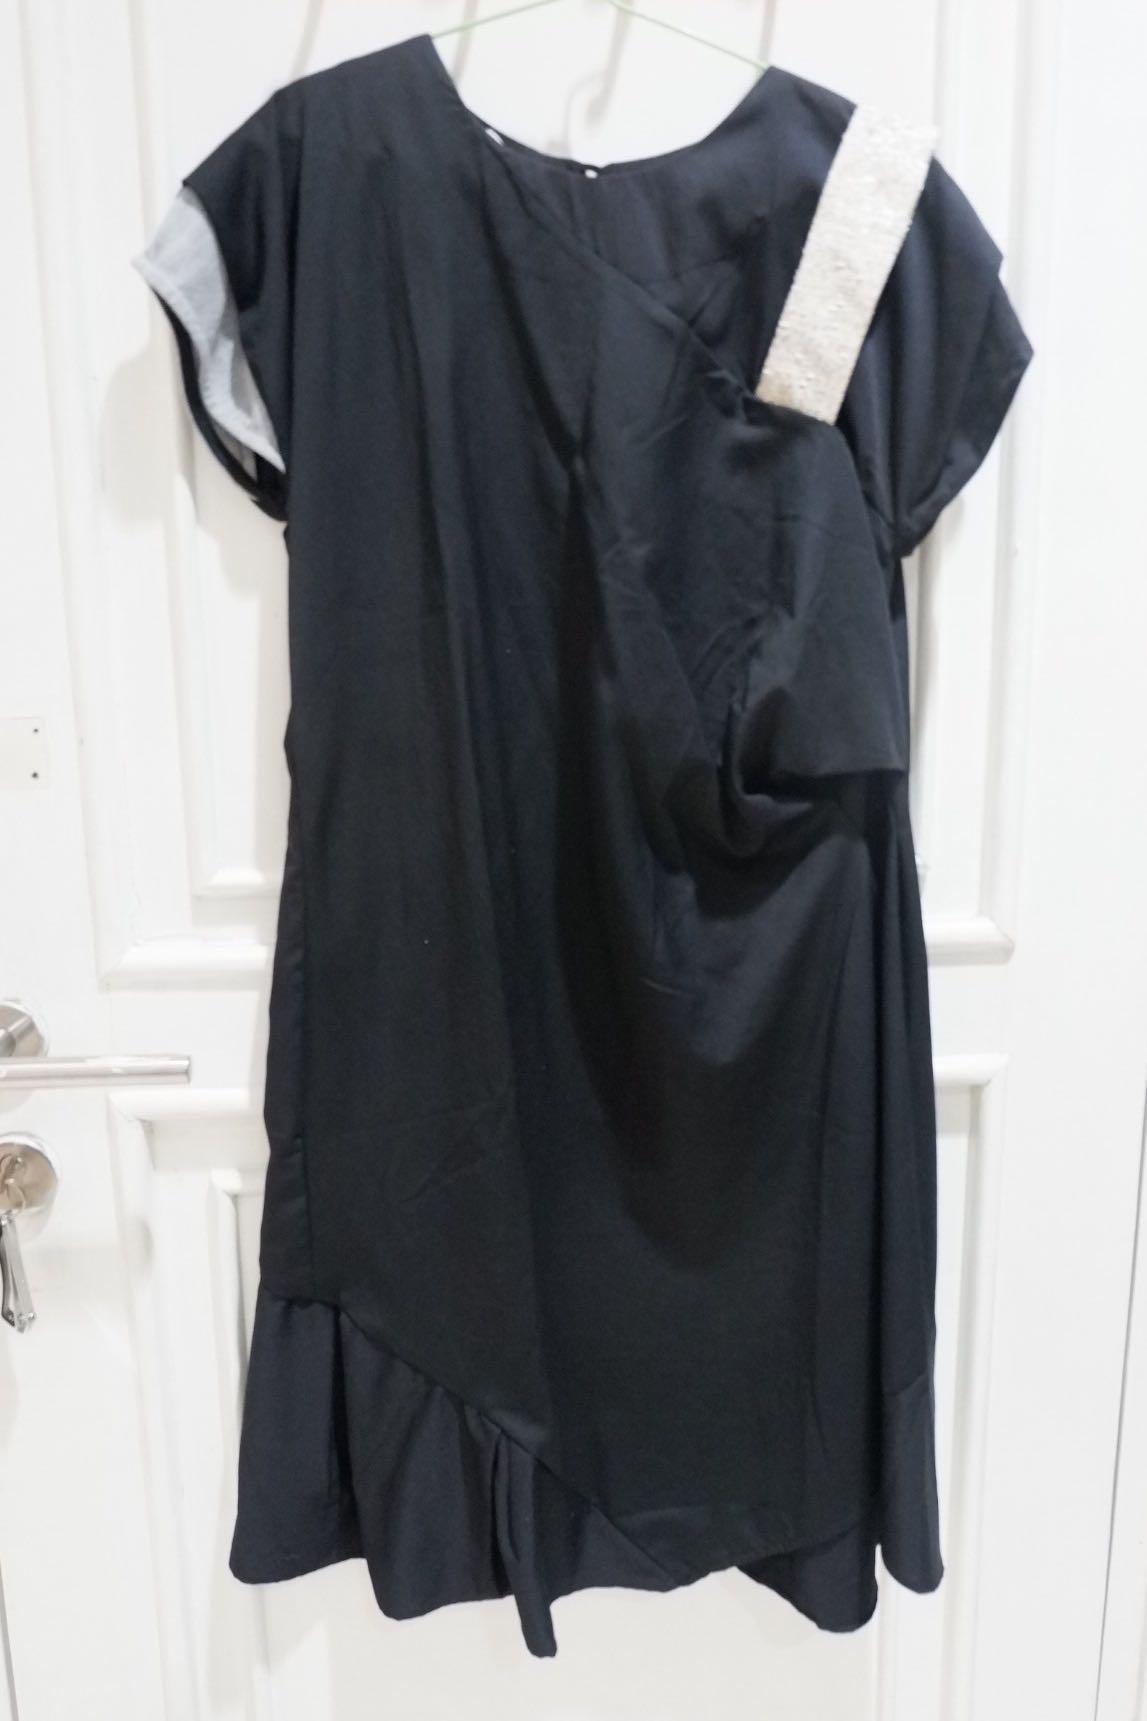 Oline Workrobe x papercut asymmetric dress